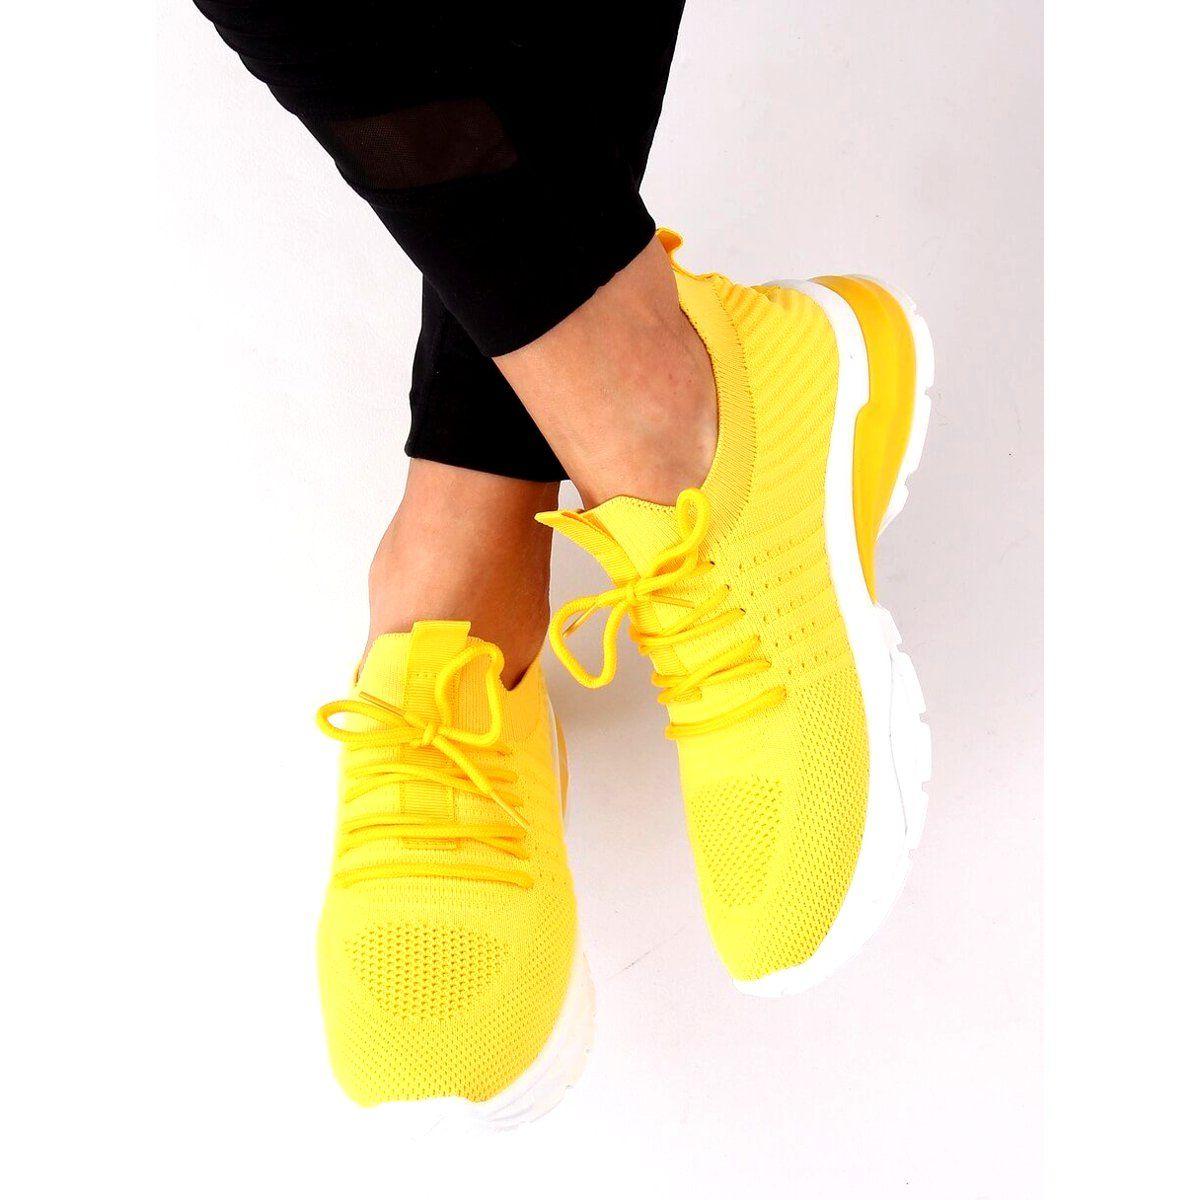 Buty Sportowe Zolte Zh 6 Turmeric Sneakers Nike Nike Free Sneakers